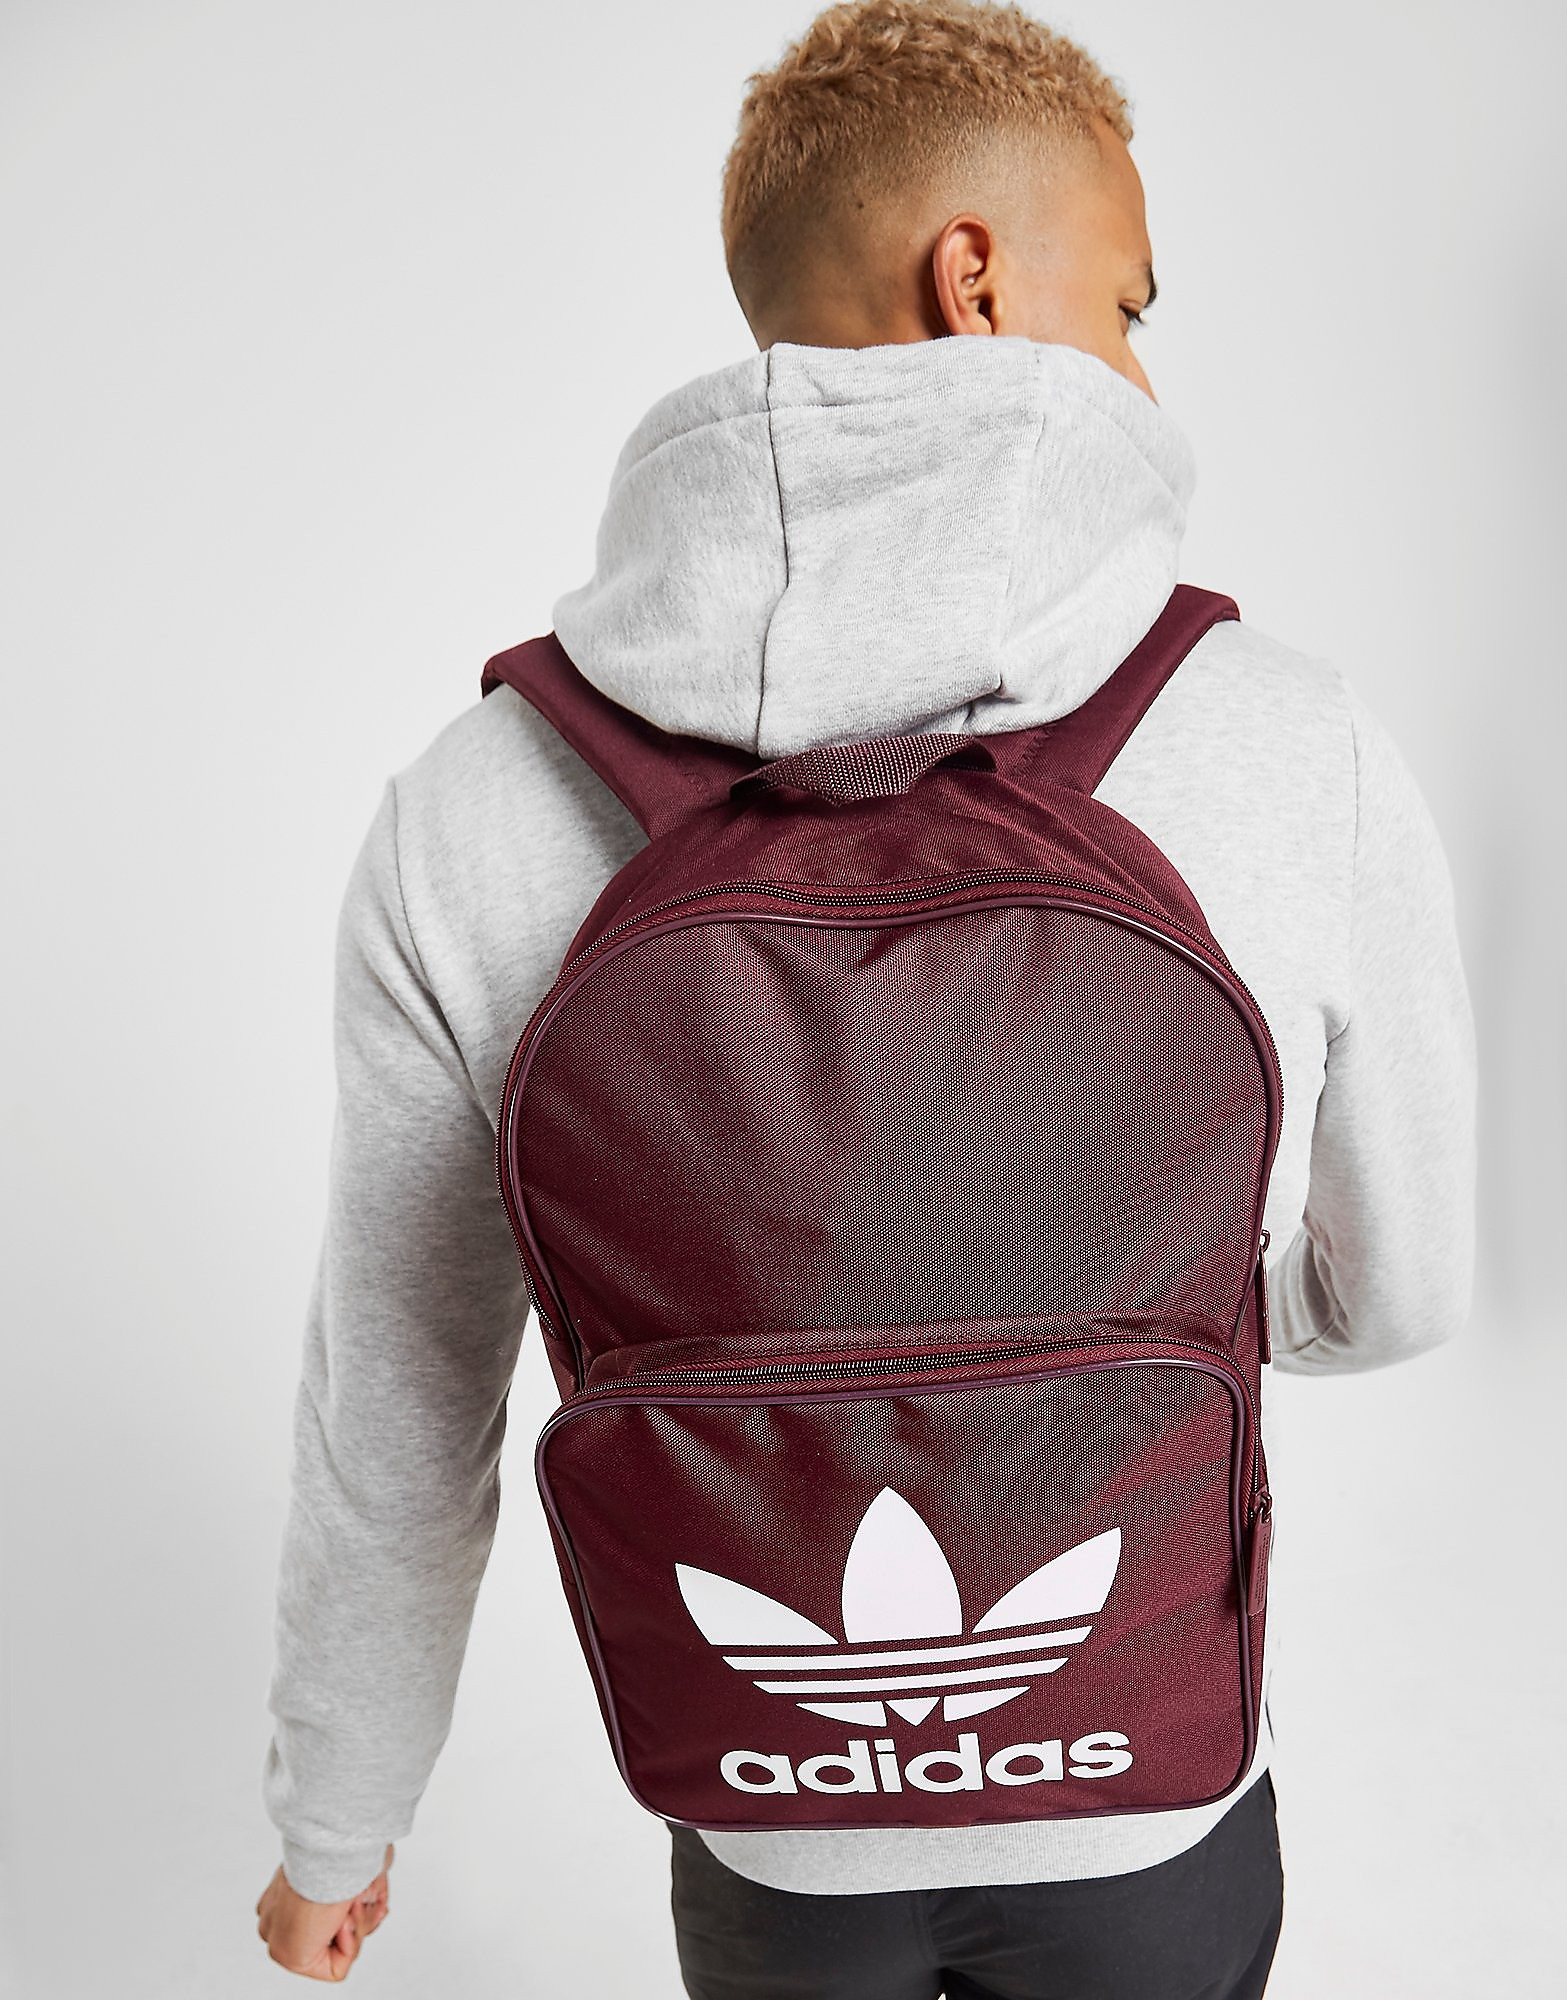 Adidas rugzak rood